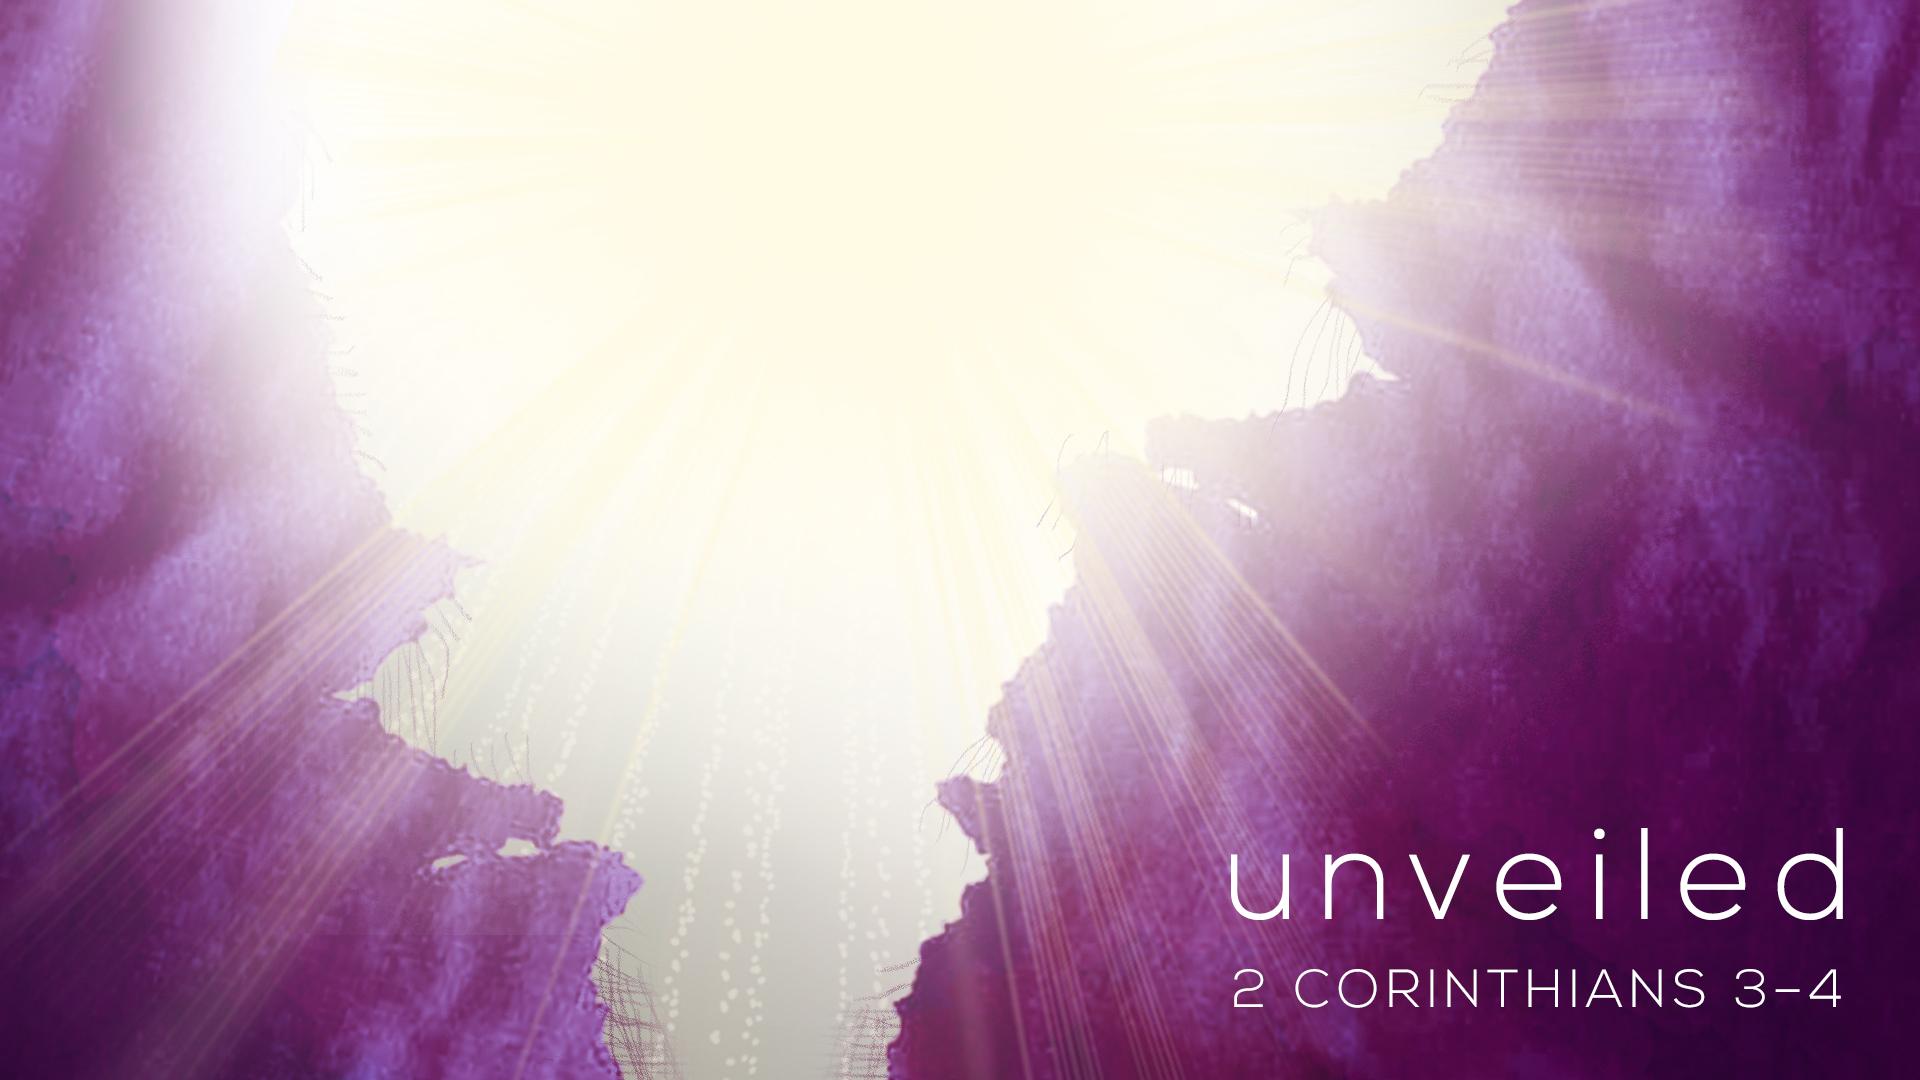 Unveiled-artwork-2.jpeg